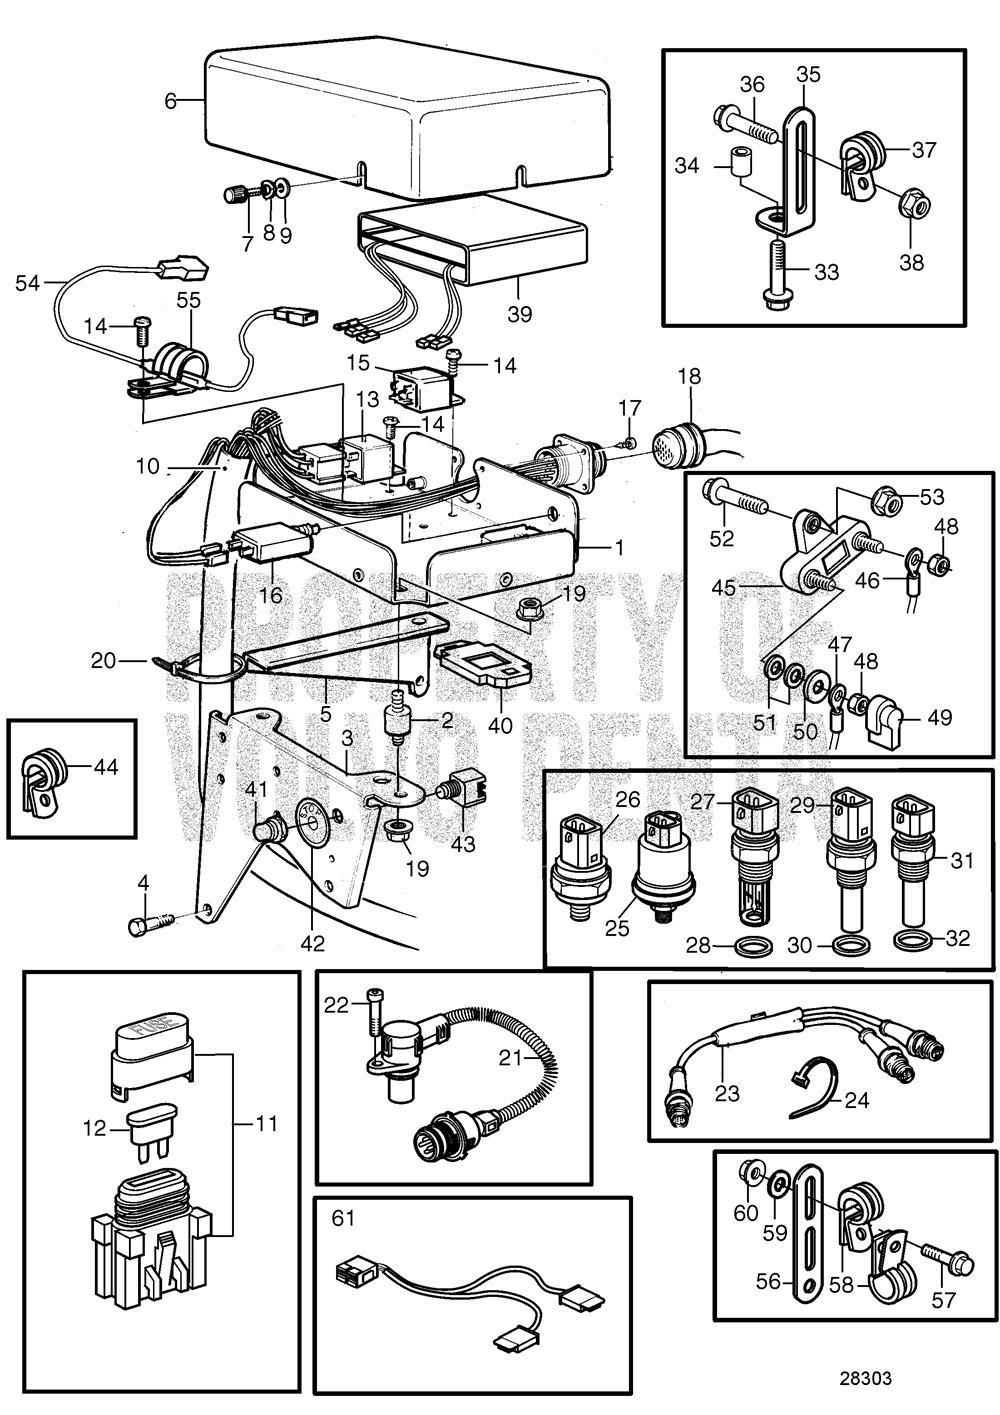 Volvo Penta Kad 43 Wiring Diagram